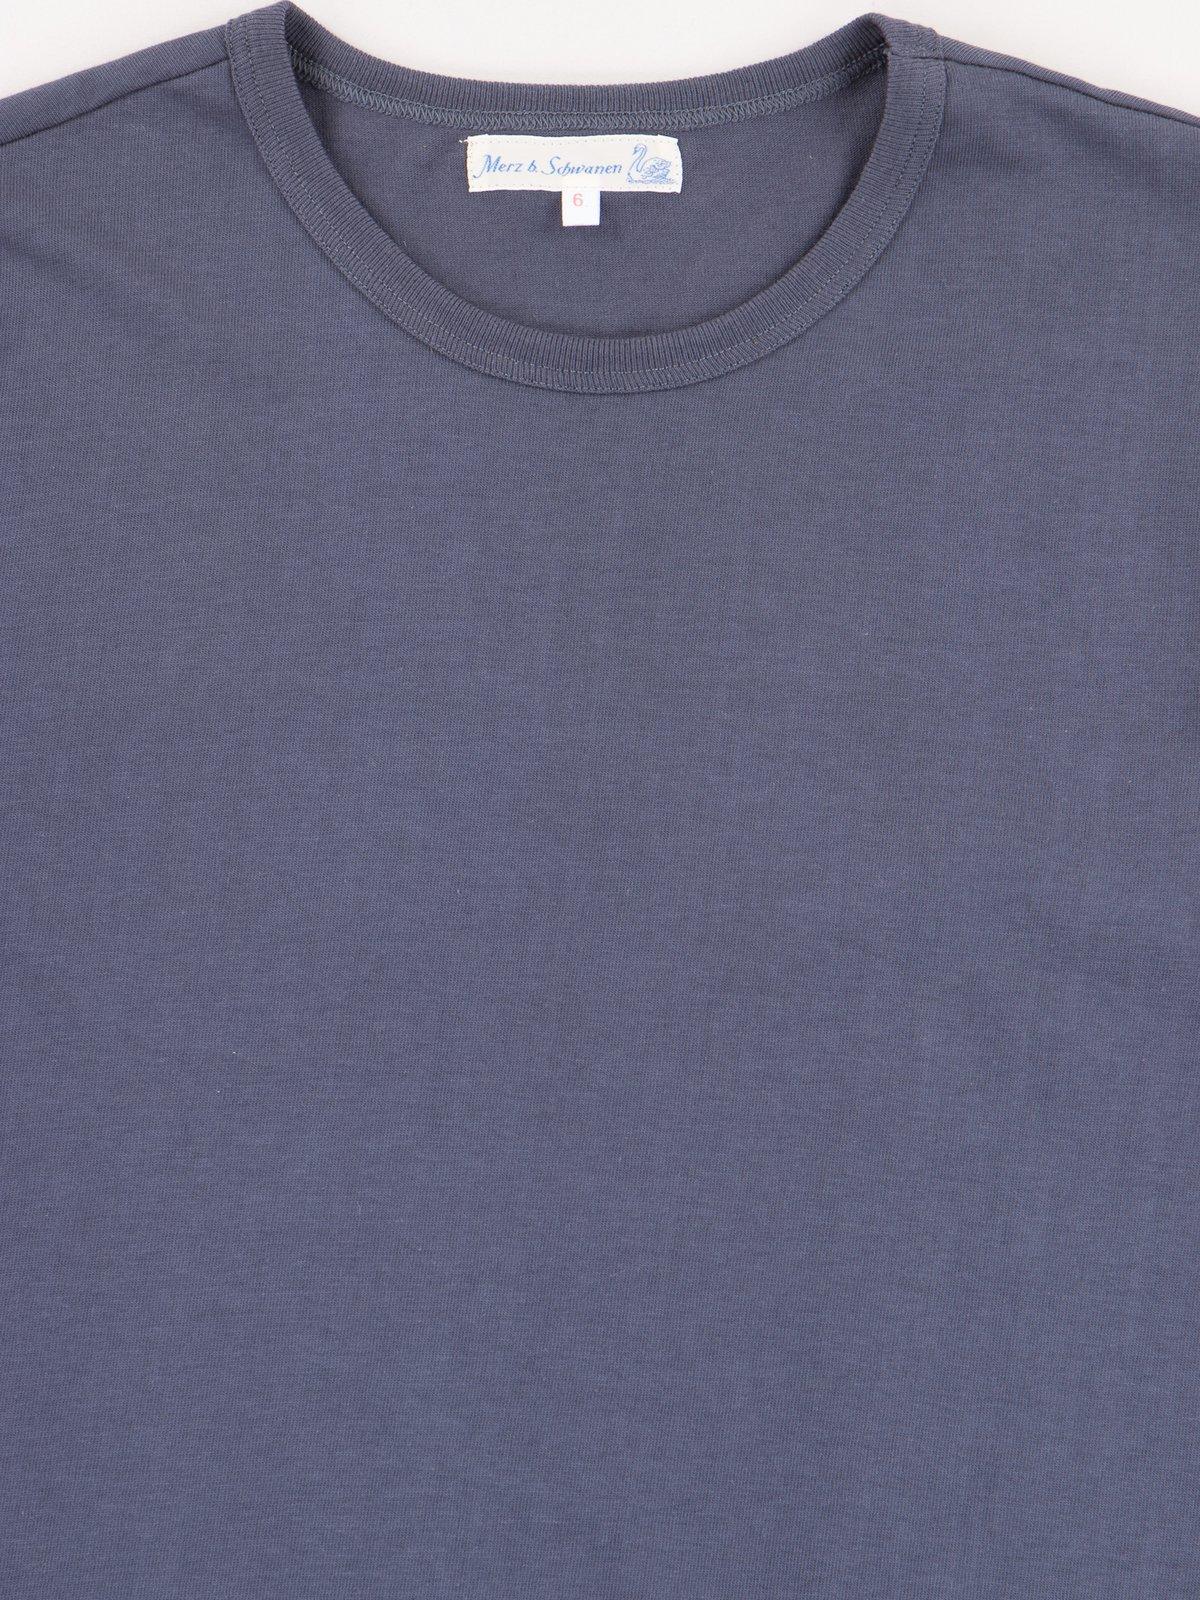 Navy 215 Organic Cotton Army Shirt - Image 2